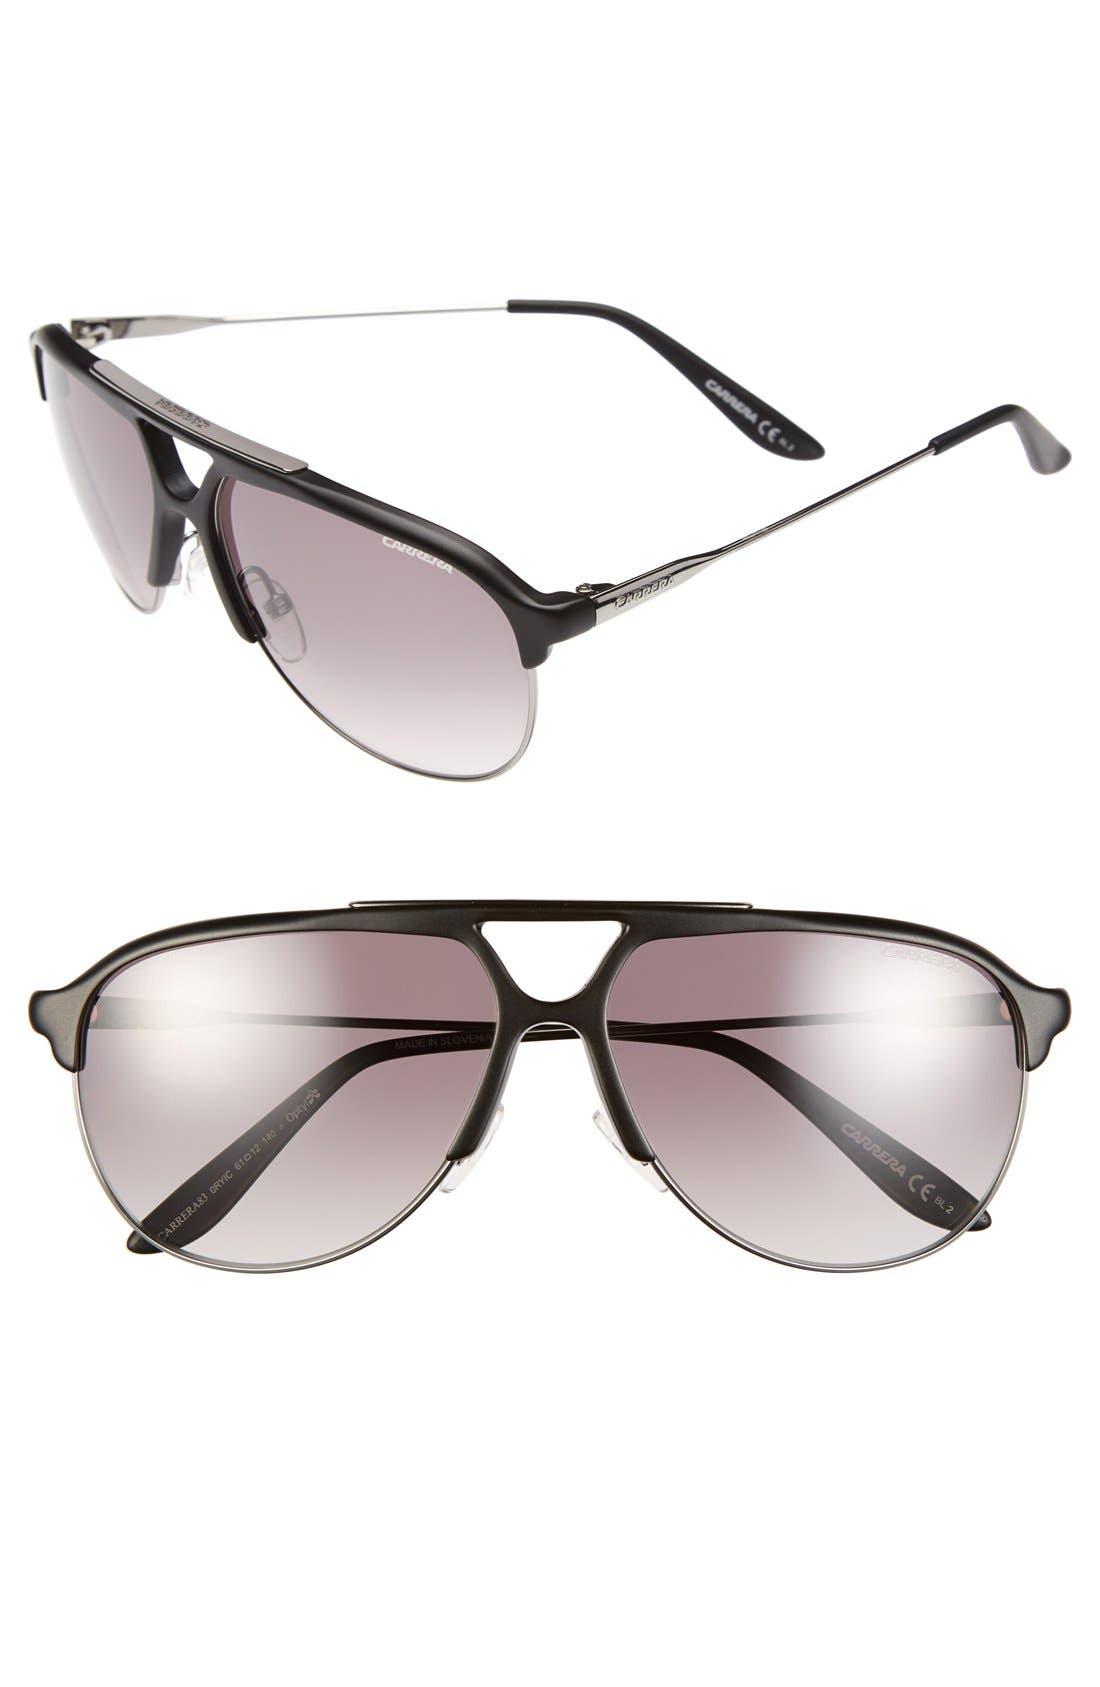 Alternate Image 1 Selected - Carrera Eyewear 61mm Sunglasses